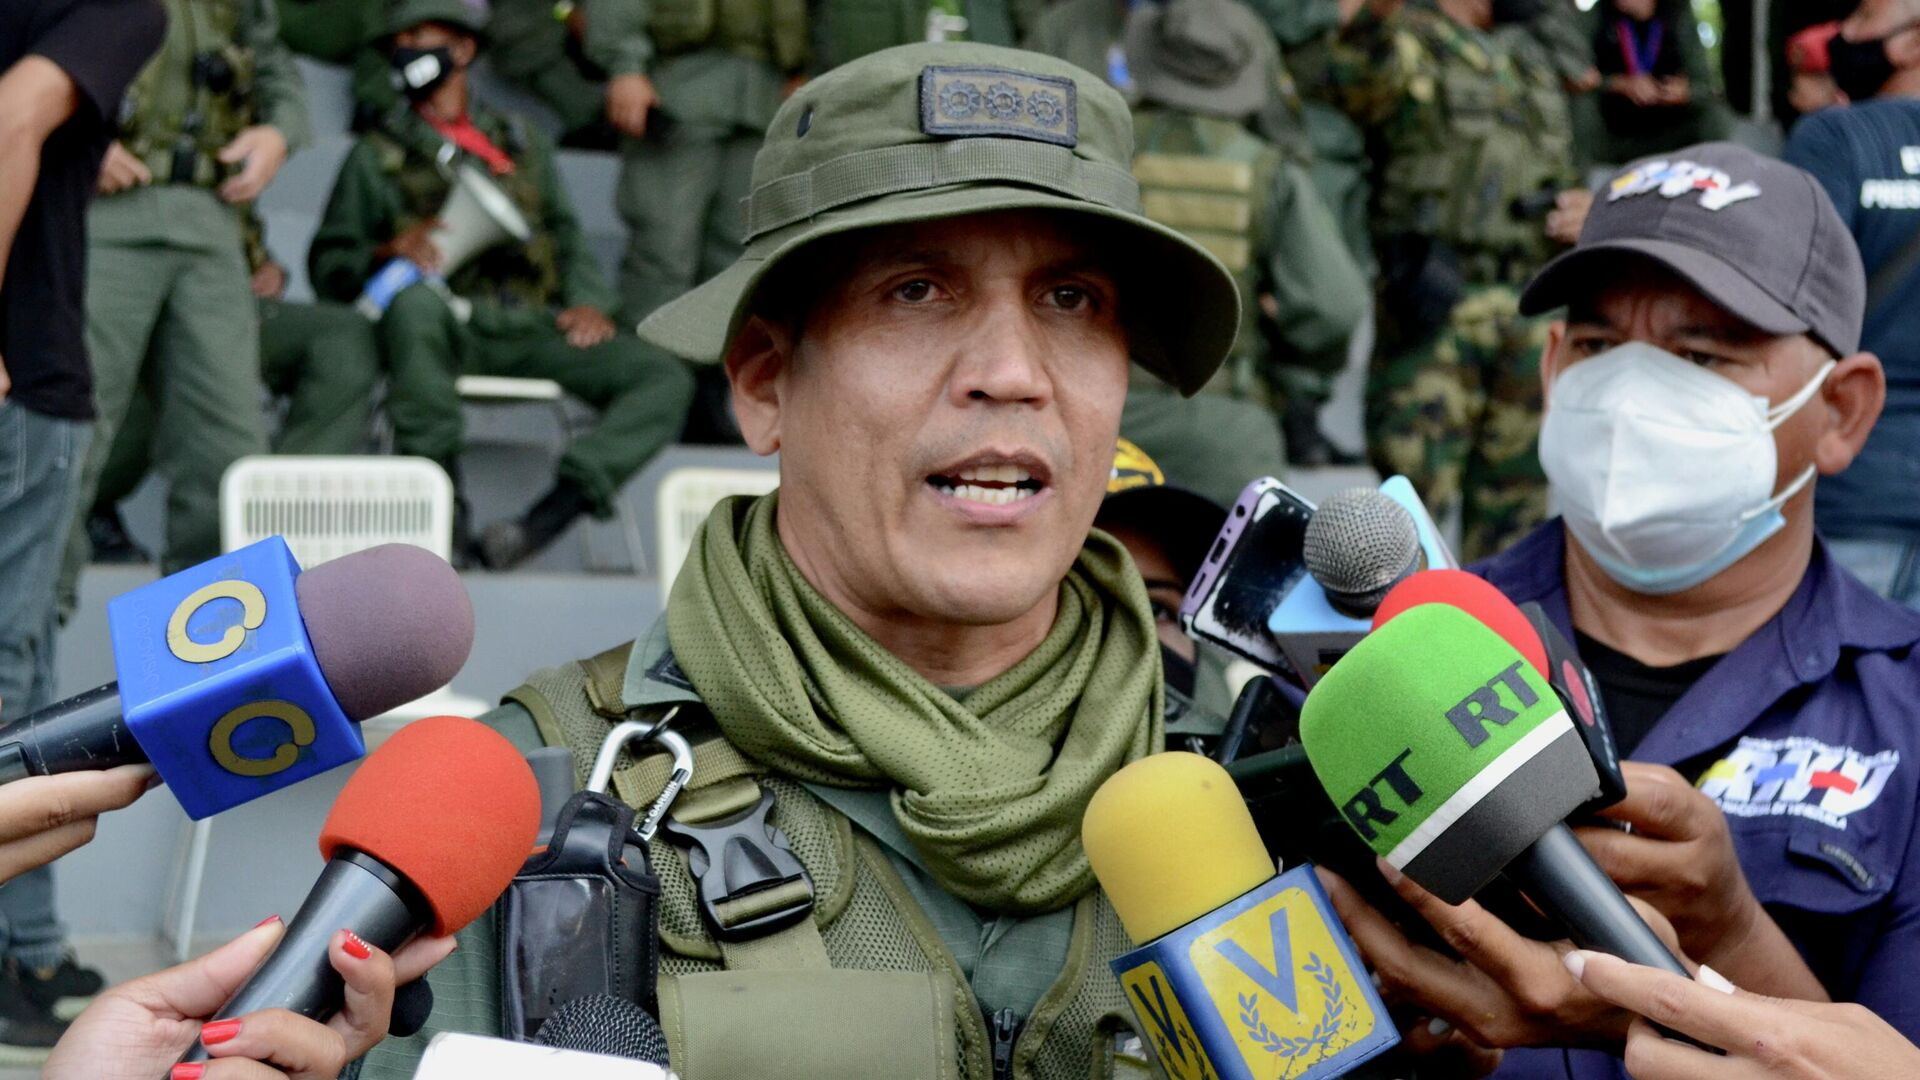 Comandante general del Ejército Bolivariano, Domingo Hernández Lares - Sputnik Mundo, 1920, 24.06.2021